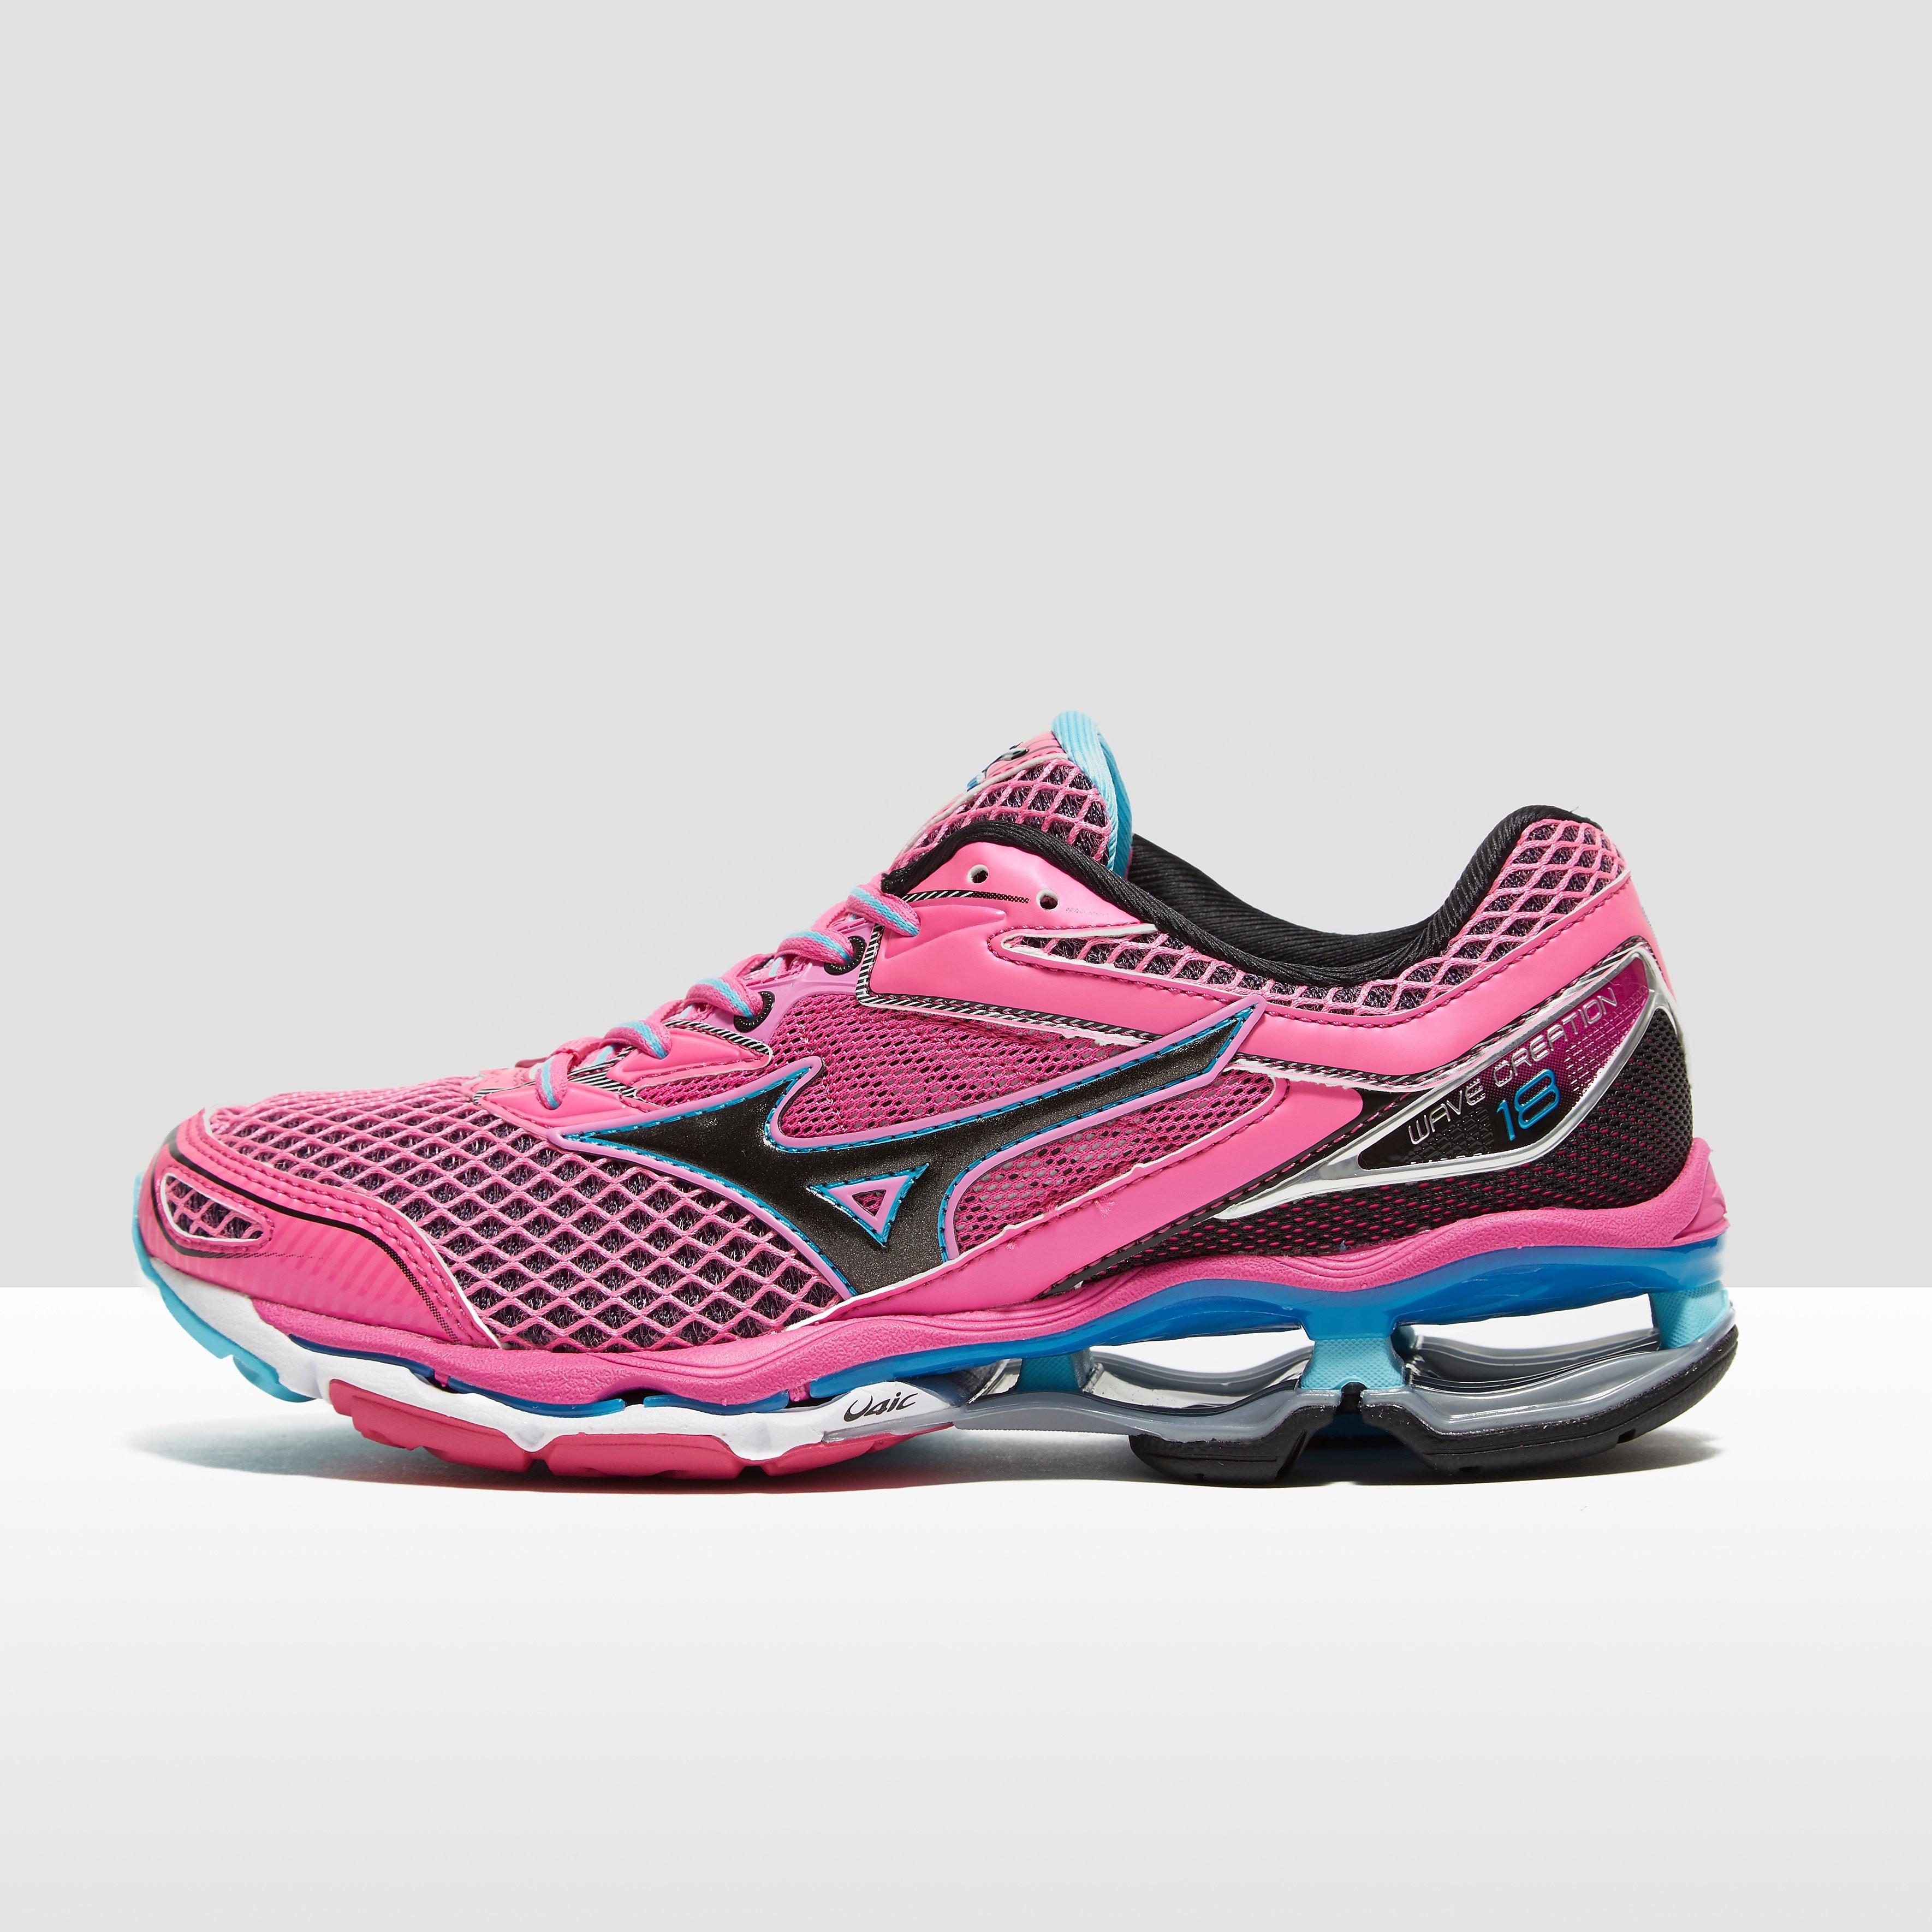 Mizuno Wave Creation 18 Women's Running Shoes